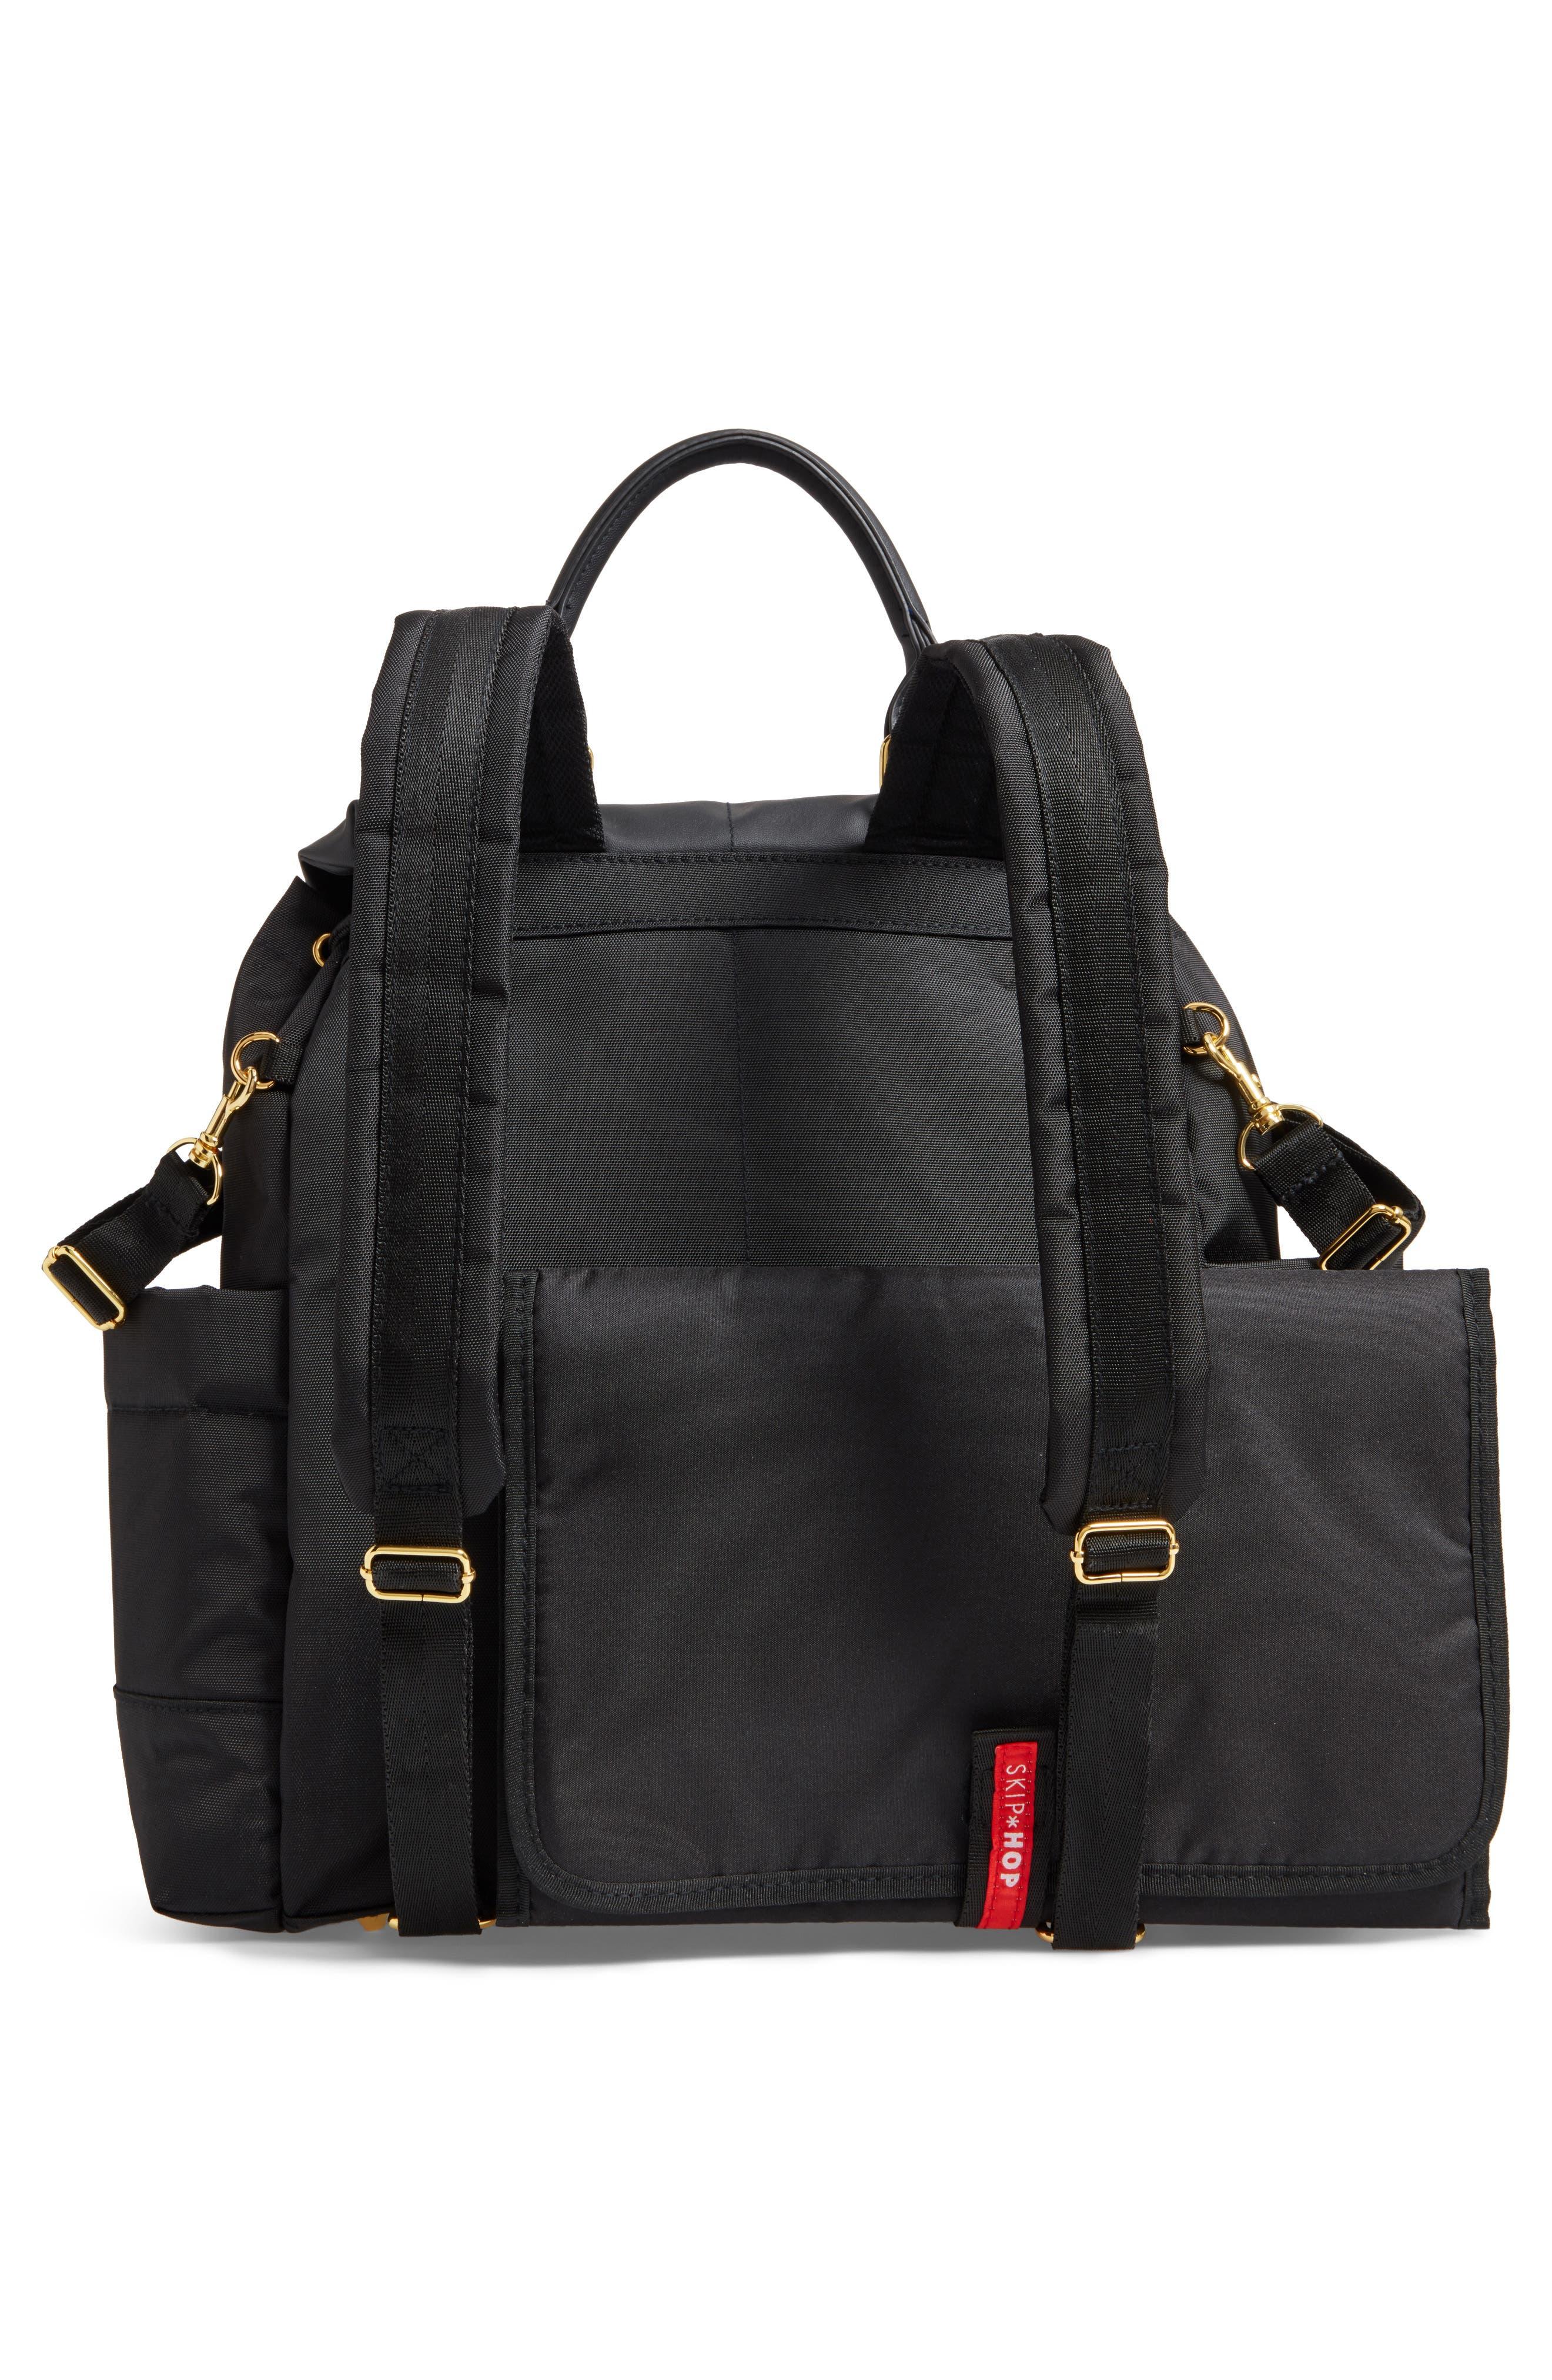 'Chelsea' Diaper Bag Backpack,                             Alternate thumbnail 3, color,                             BLACK